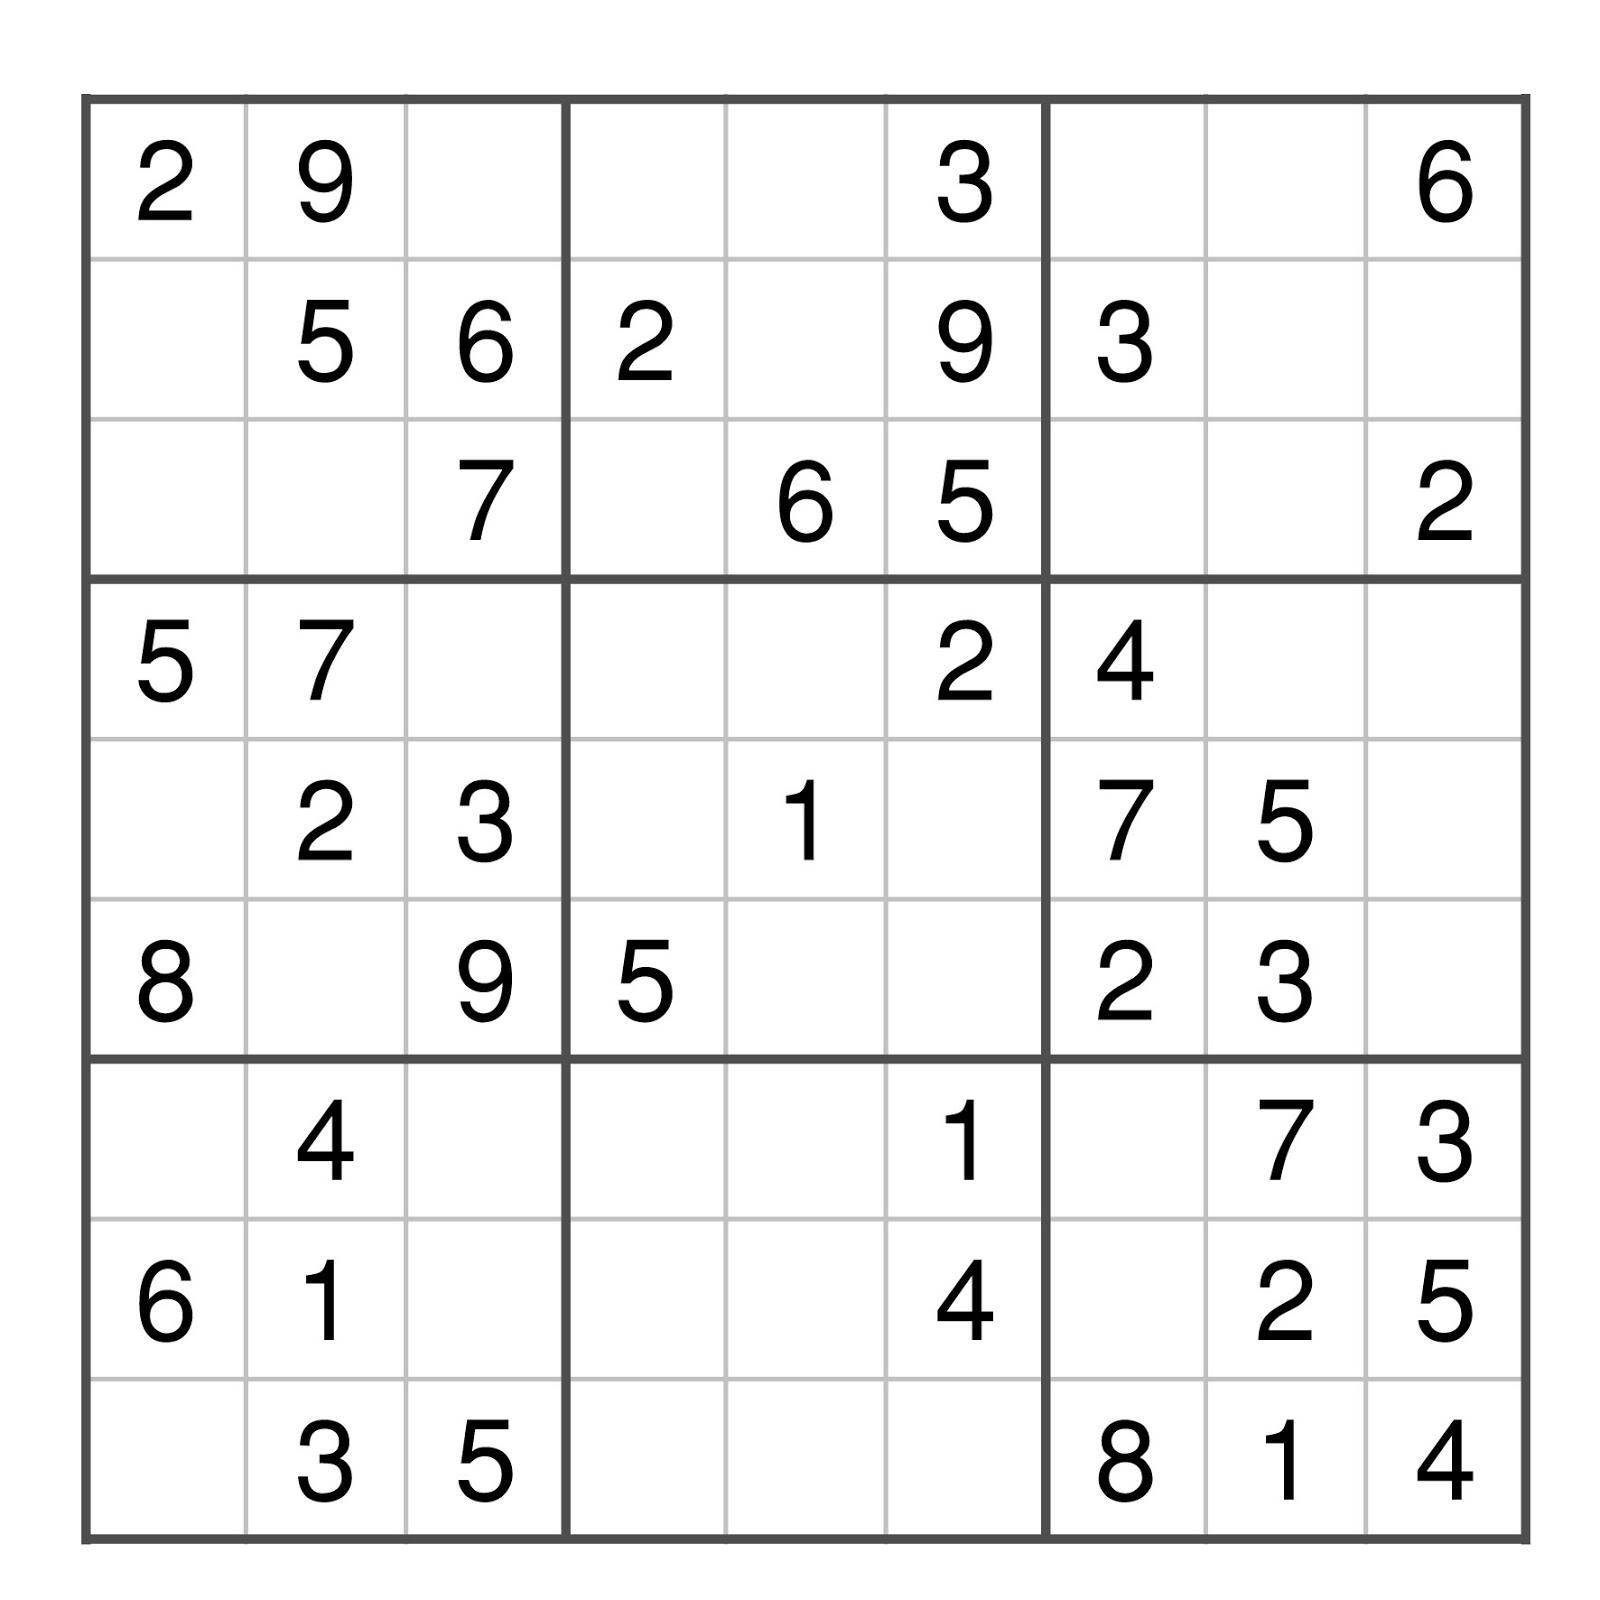 Jeu De Sudoku En Ligne Gratuit destiné Jeu Le Sudoku